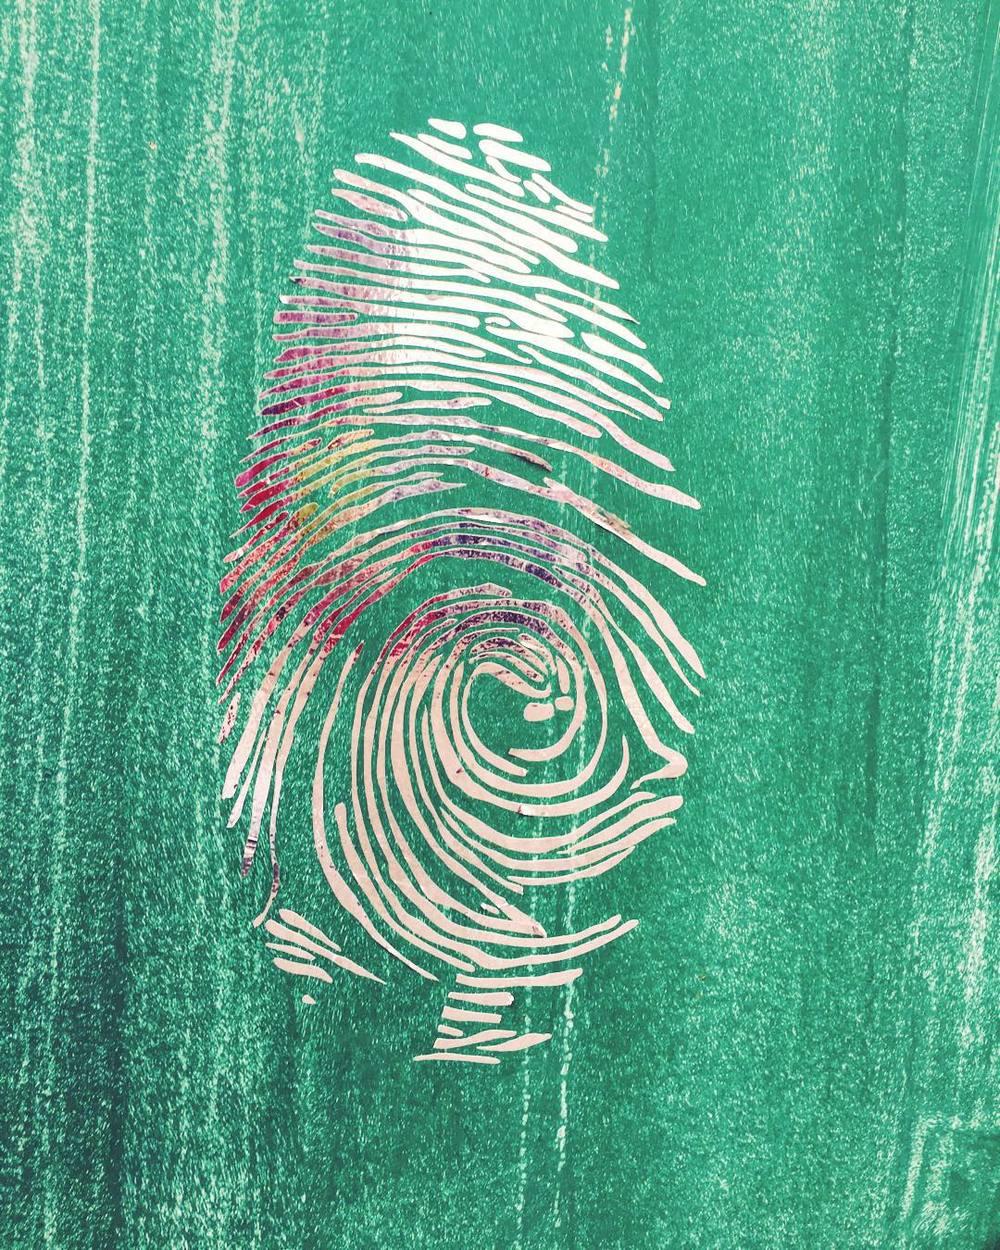 thumbsup-dude-silver-flashtattoo-style-graffiti--green-wall-quite-festive-such-shiny-much-print-fingerprint-363365_24008325811_o.jpg